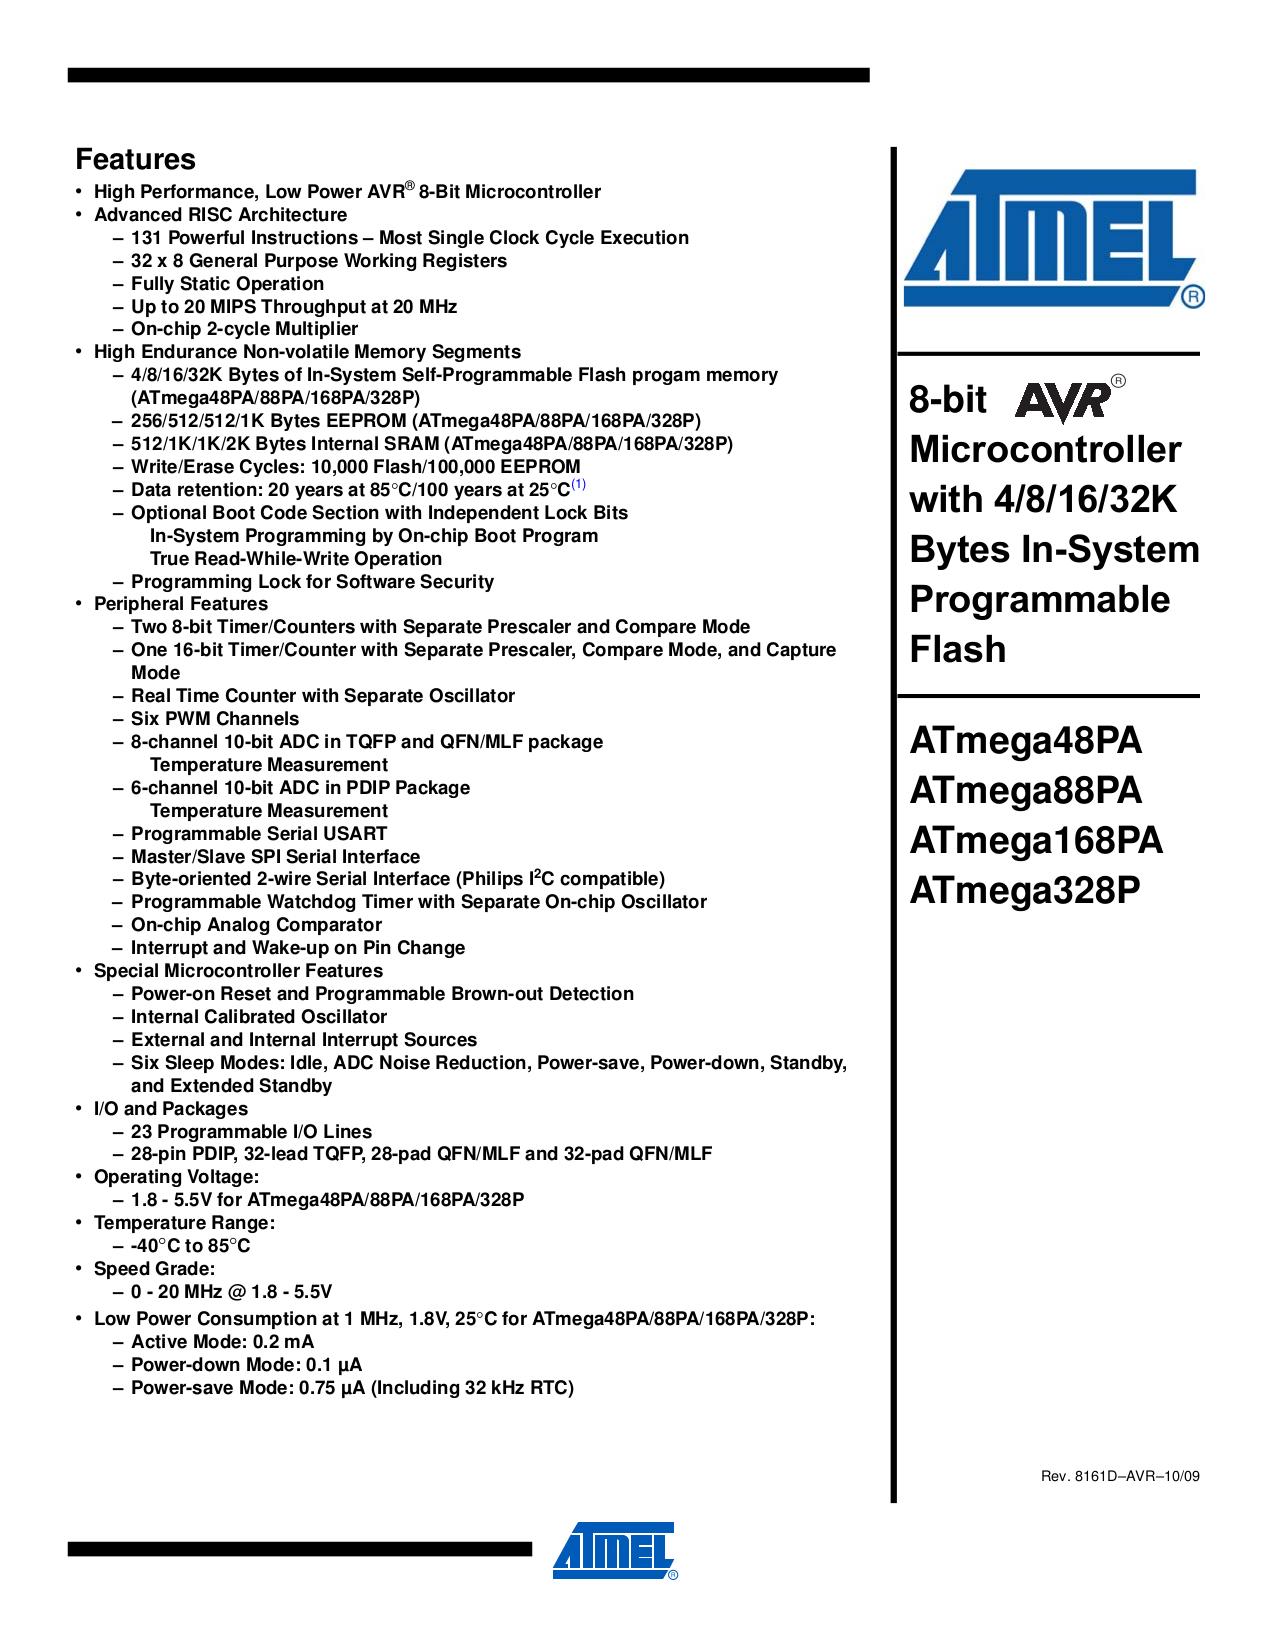 Atmega328p-pu pdf datasheet atmel agent from china arduino uno.